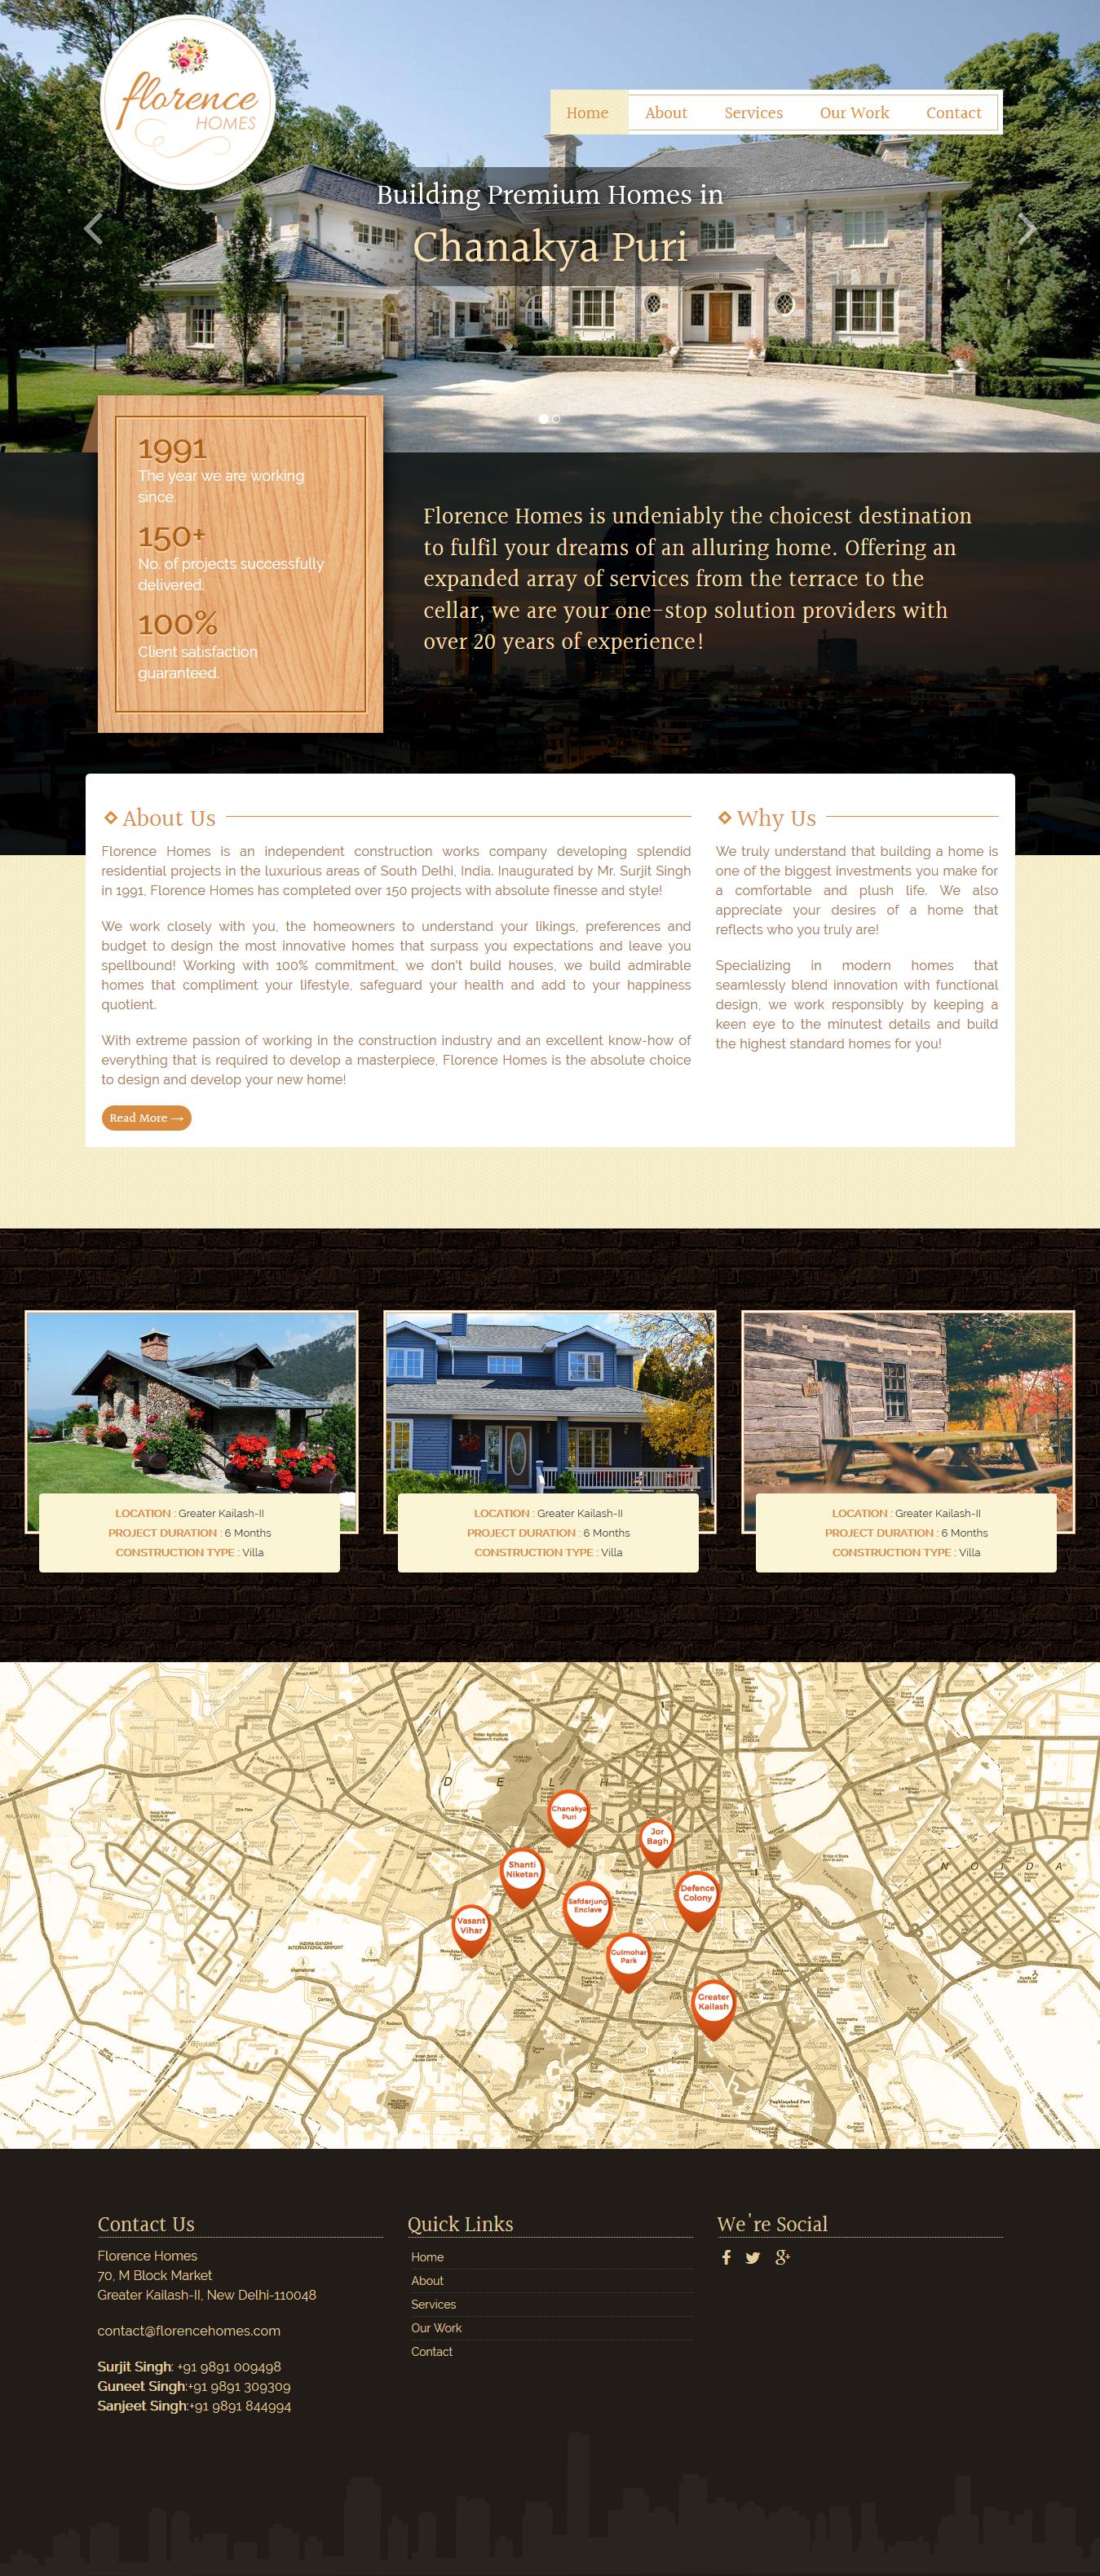 Website Design For A Premium Home Builders In Delhi, India